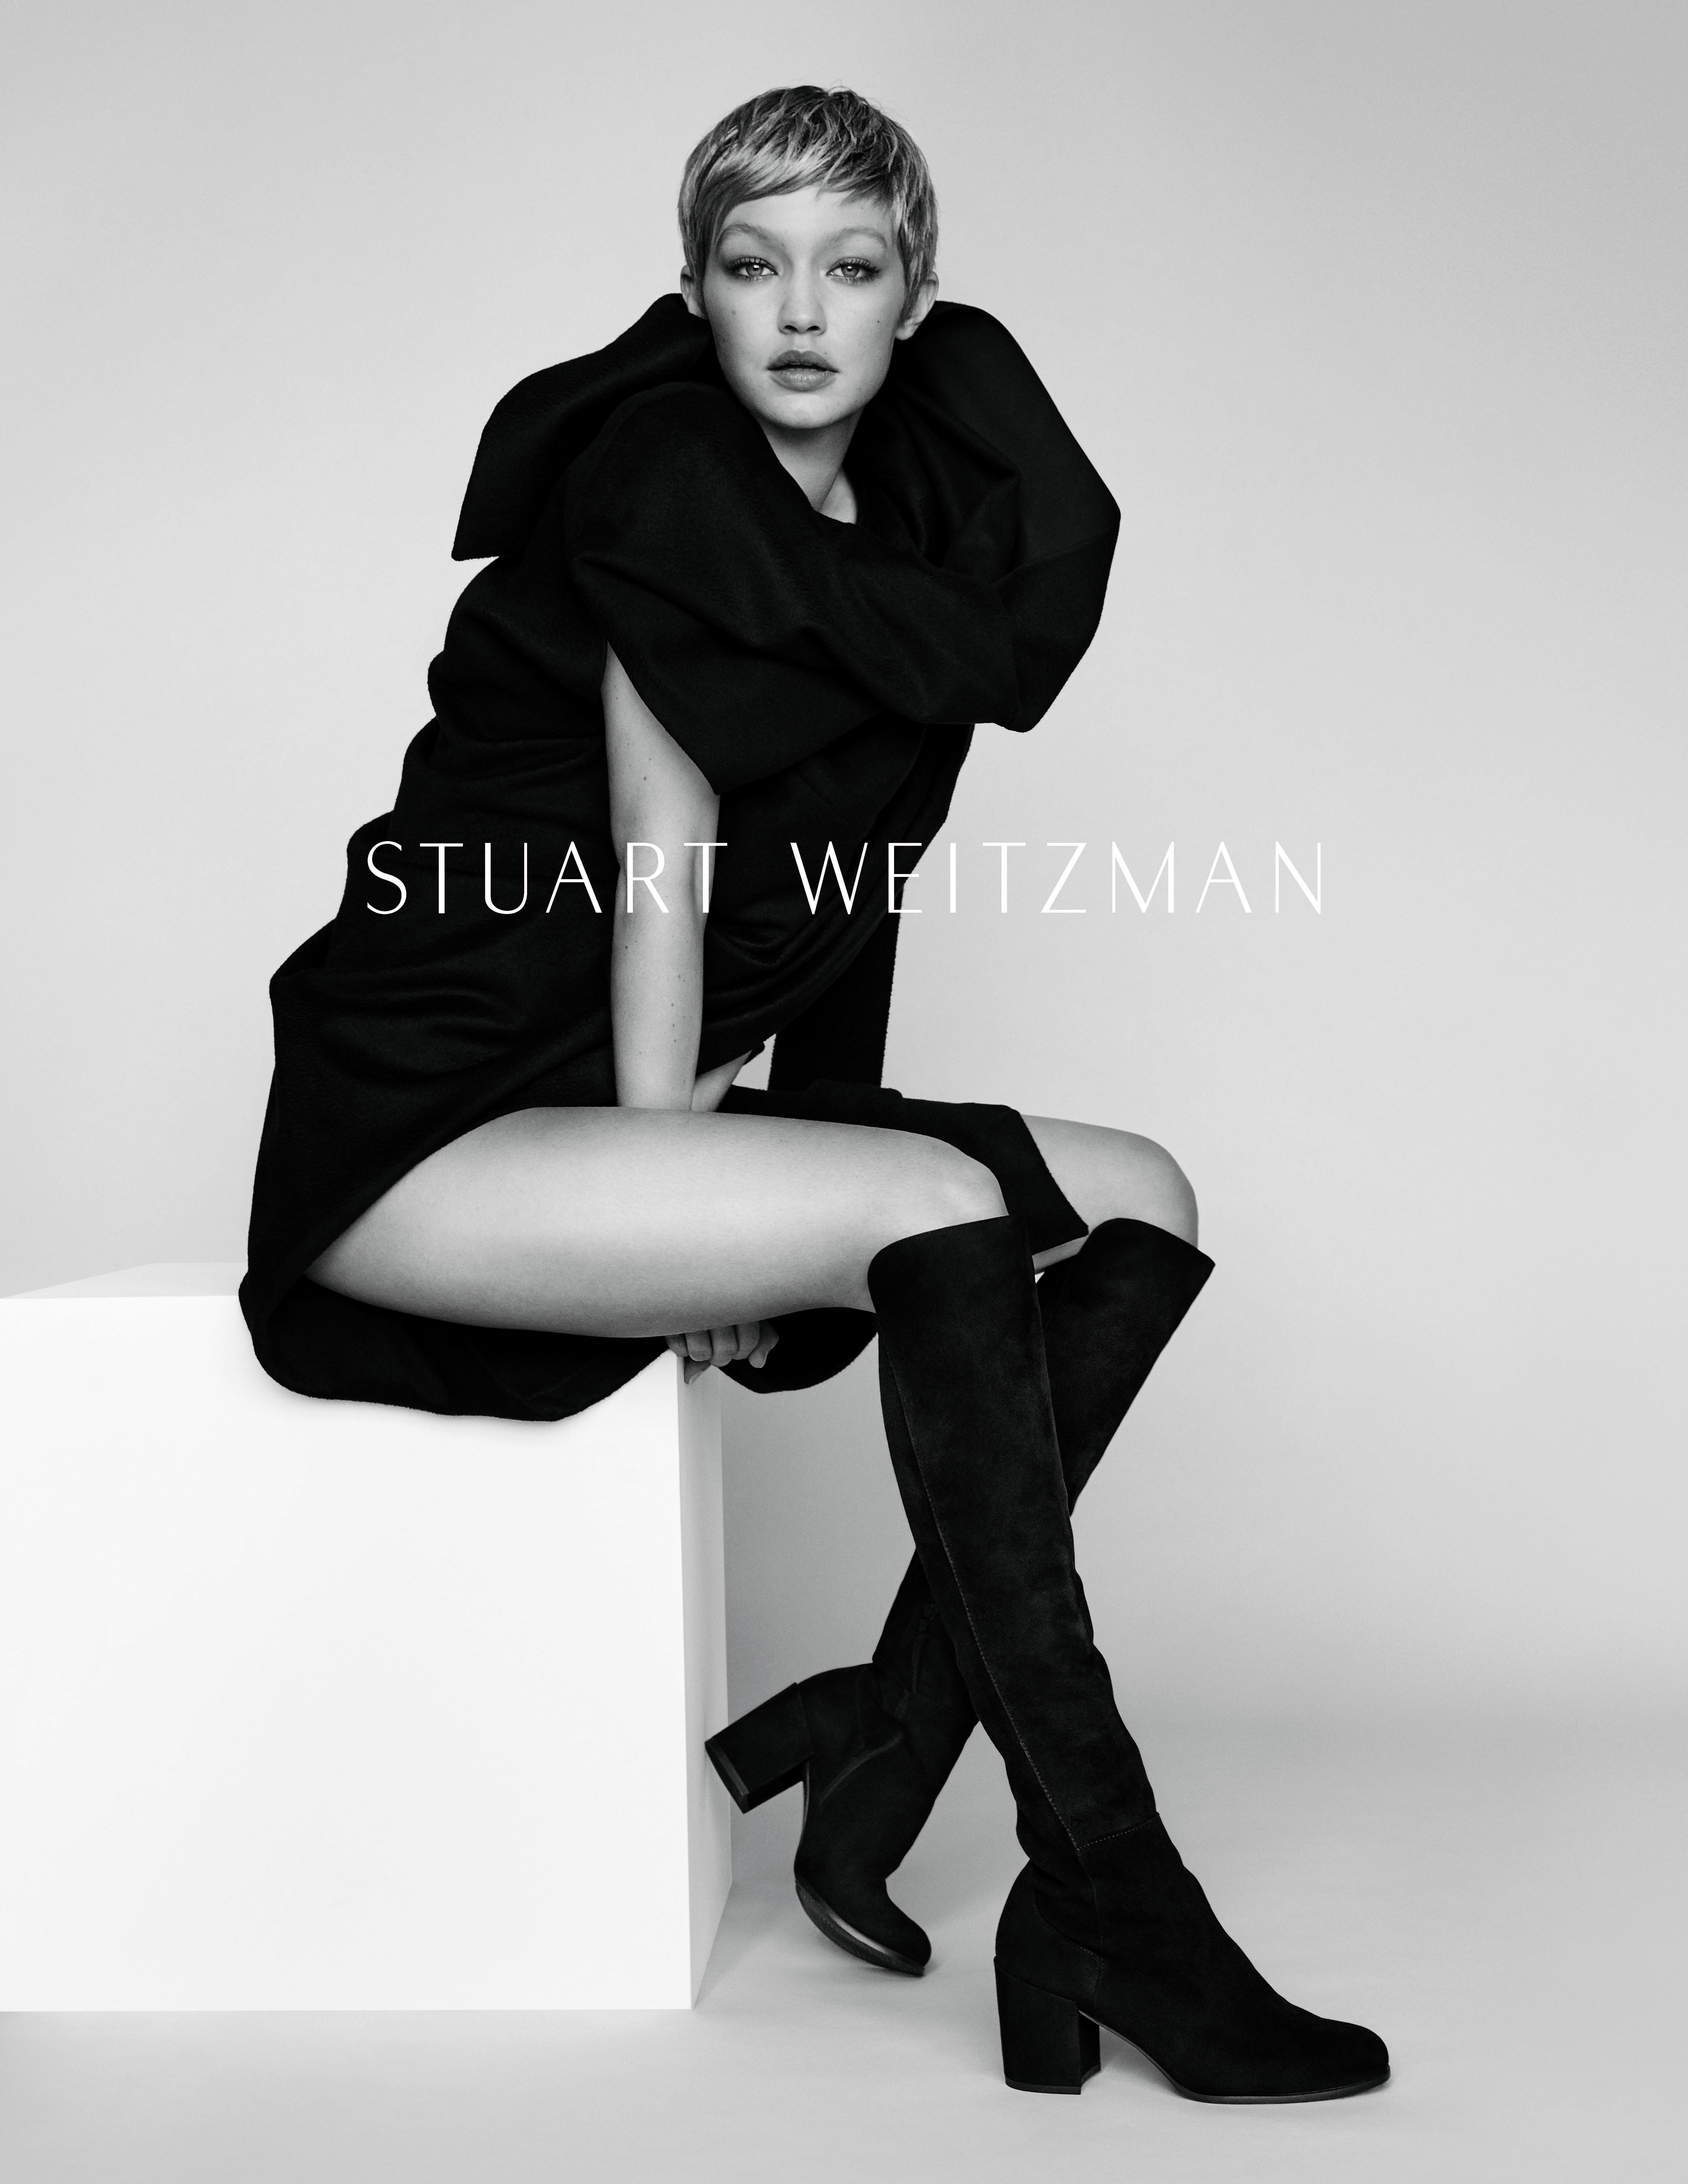 692a7f2b9f8 Gigi Hadid in the Stuart Weitzman FW17 Campaign